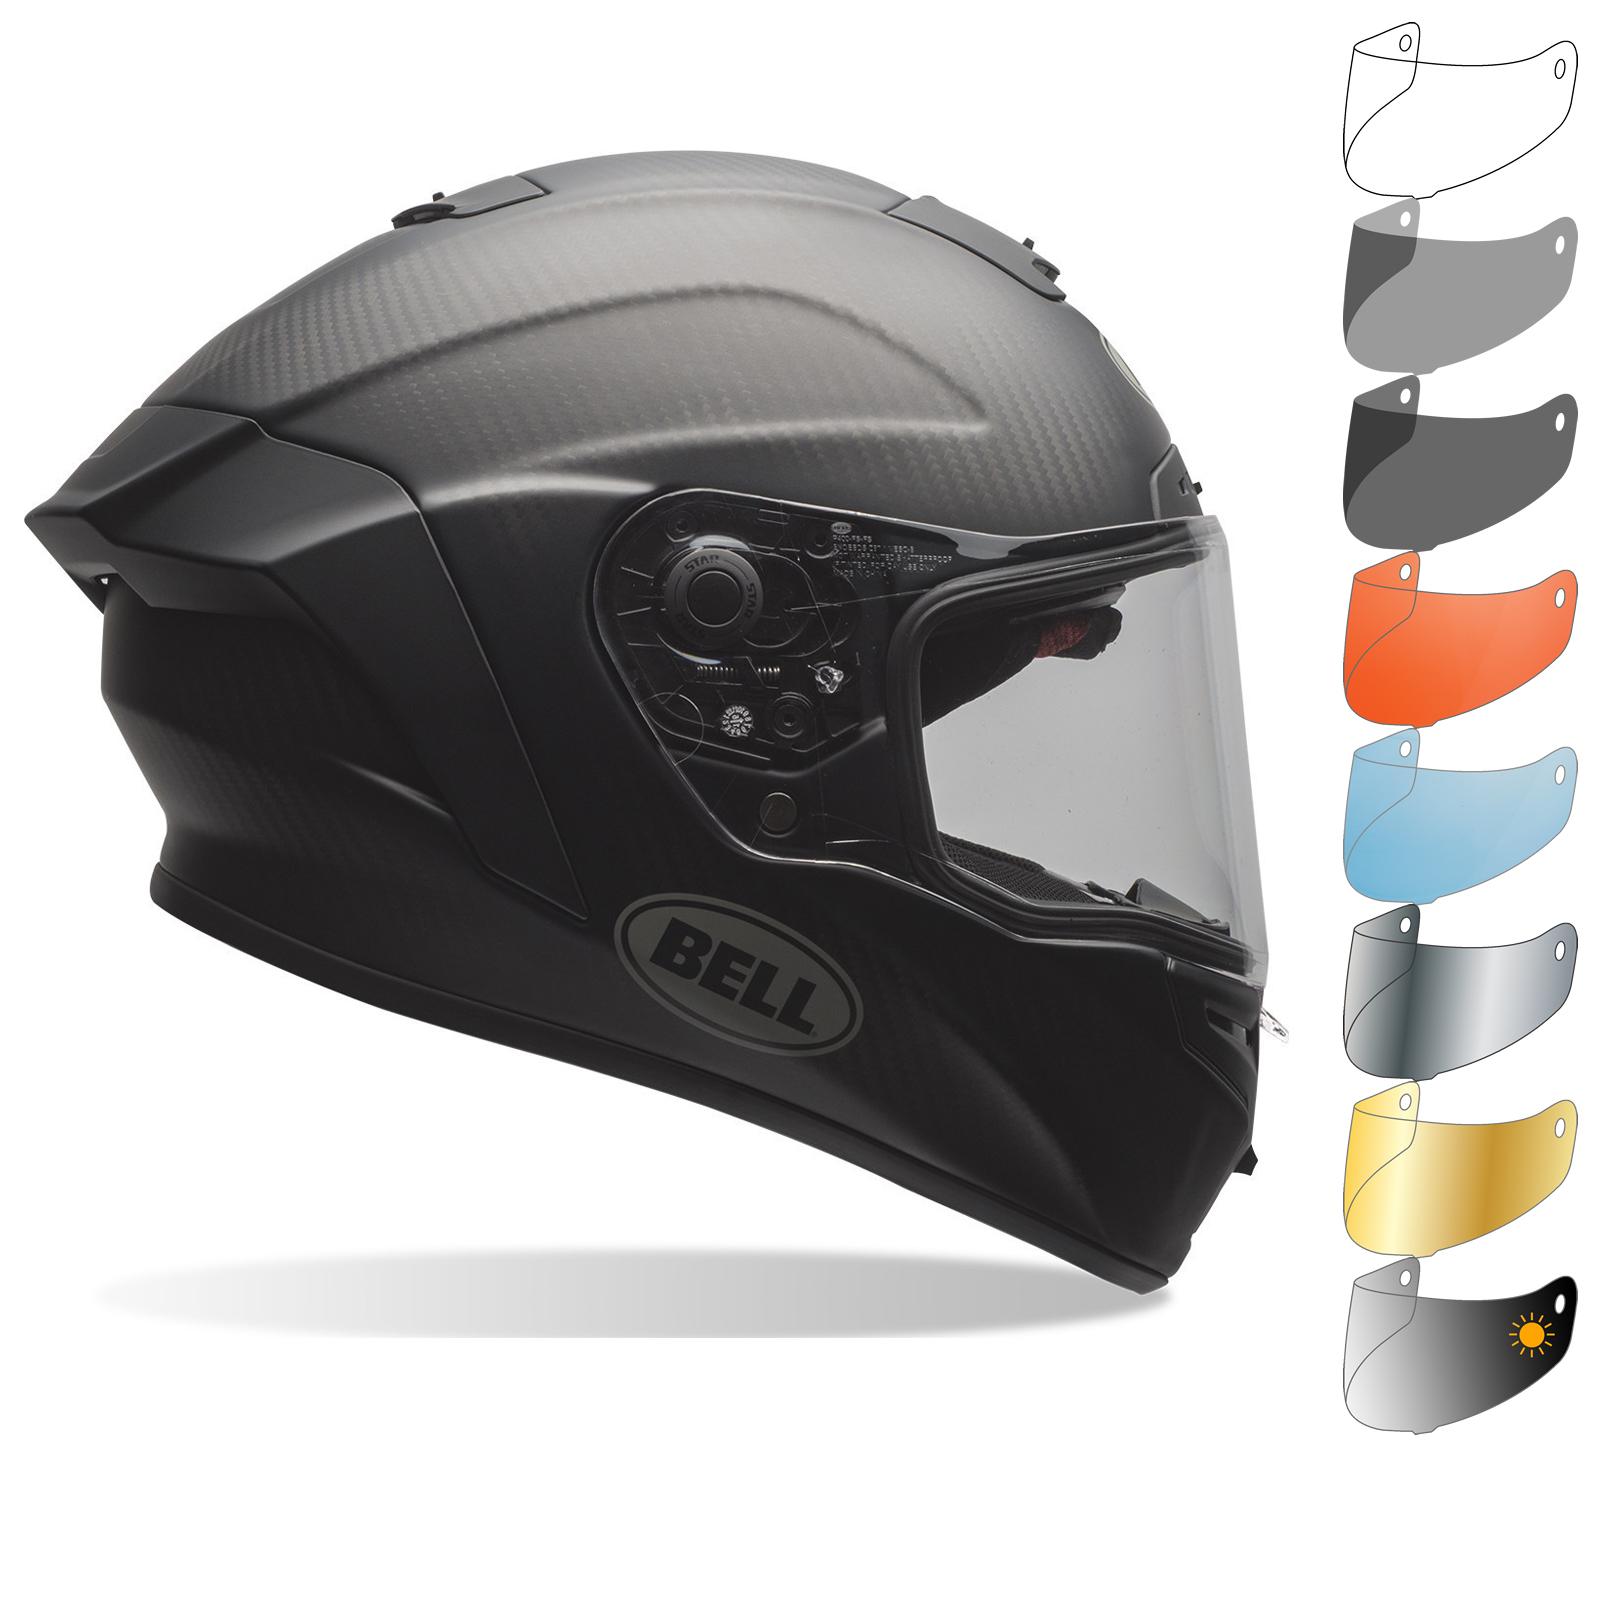 f4eb667d Bell Race Star Solid Motorcycle Helmet & Visor Integral Biker Lid ...